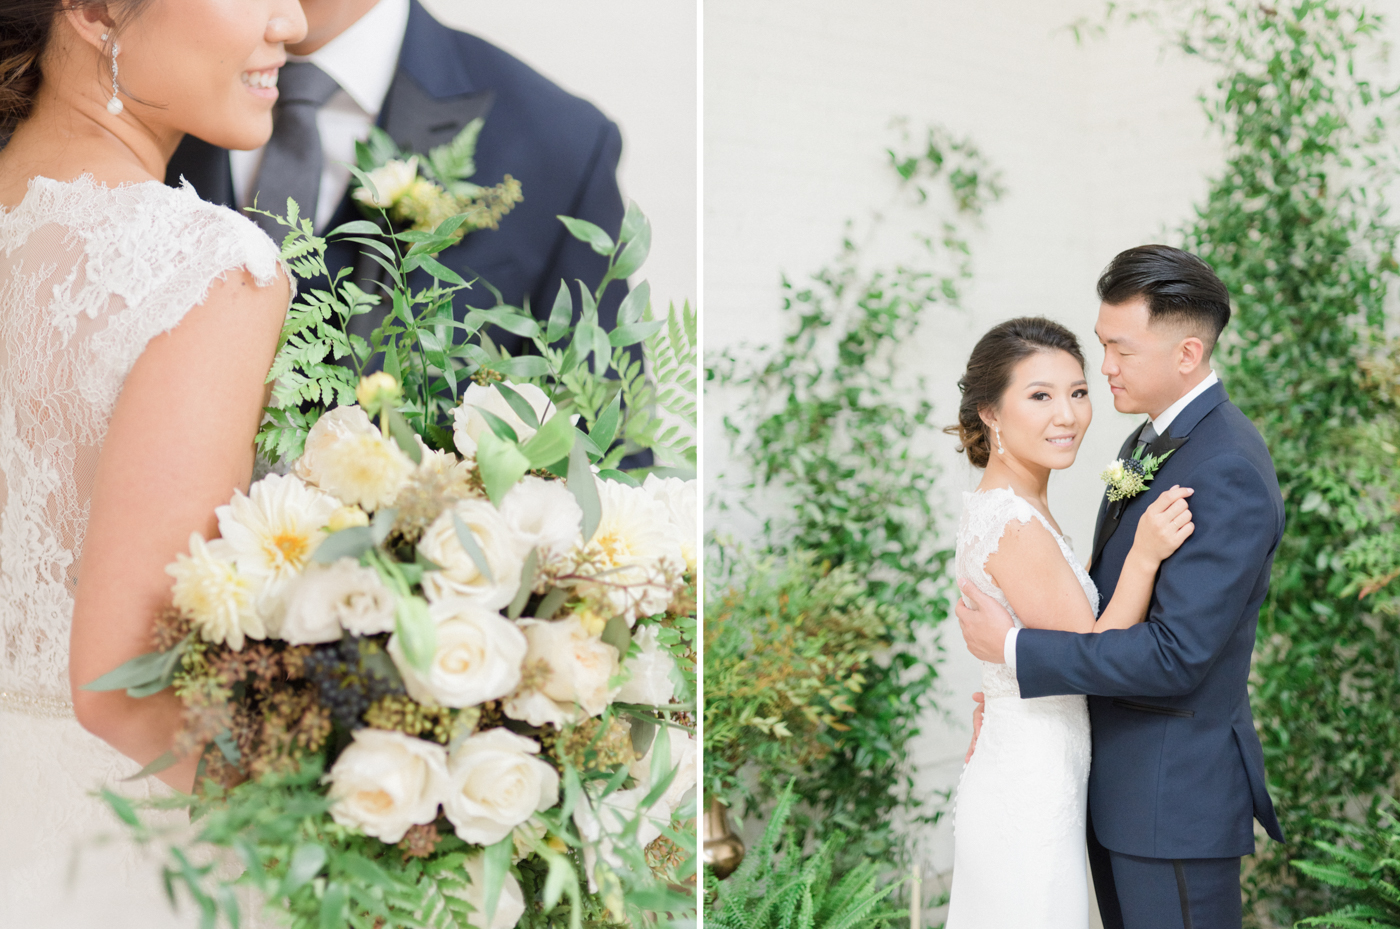 Modern_Wedding_HNYPT_Honeypot_LA_Photographer_Los_Angeles-15.jpg